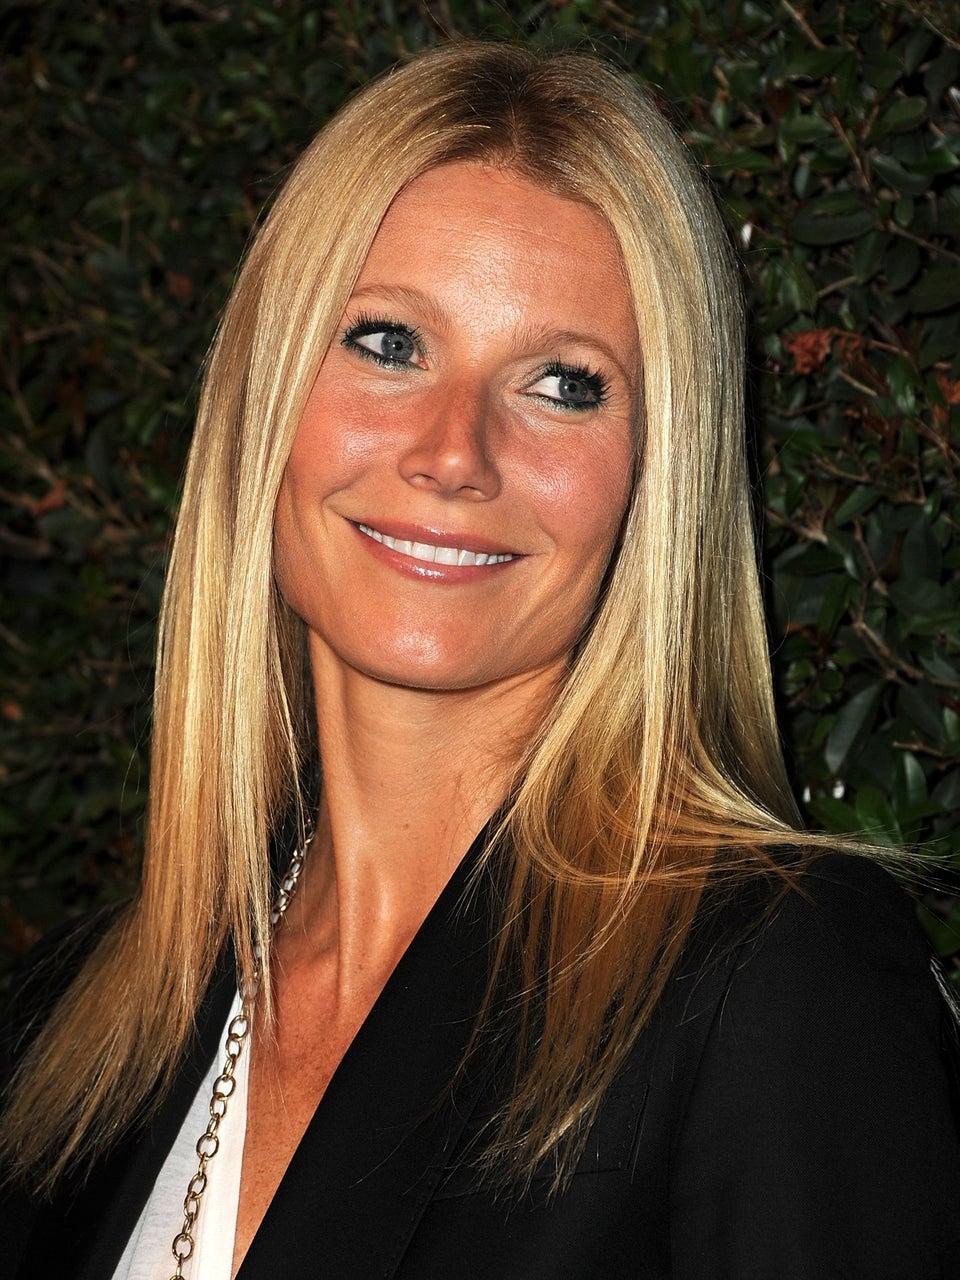 Real Talk: Gwyneth Paltrow Drops the N-Bomb, So What?